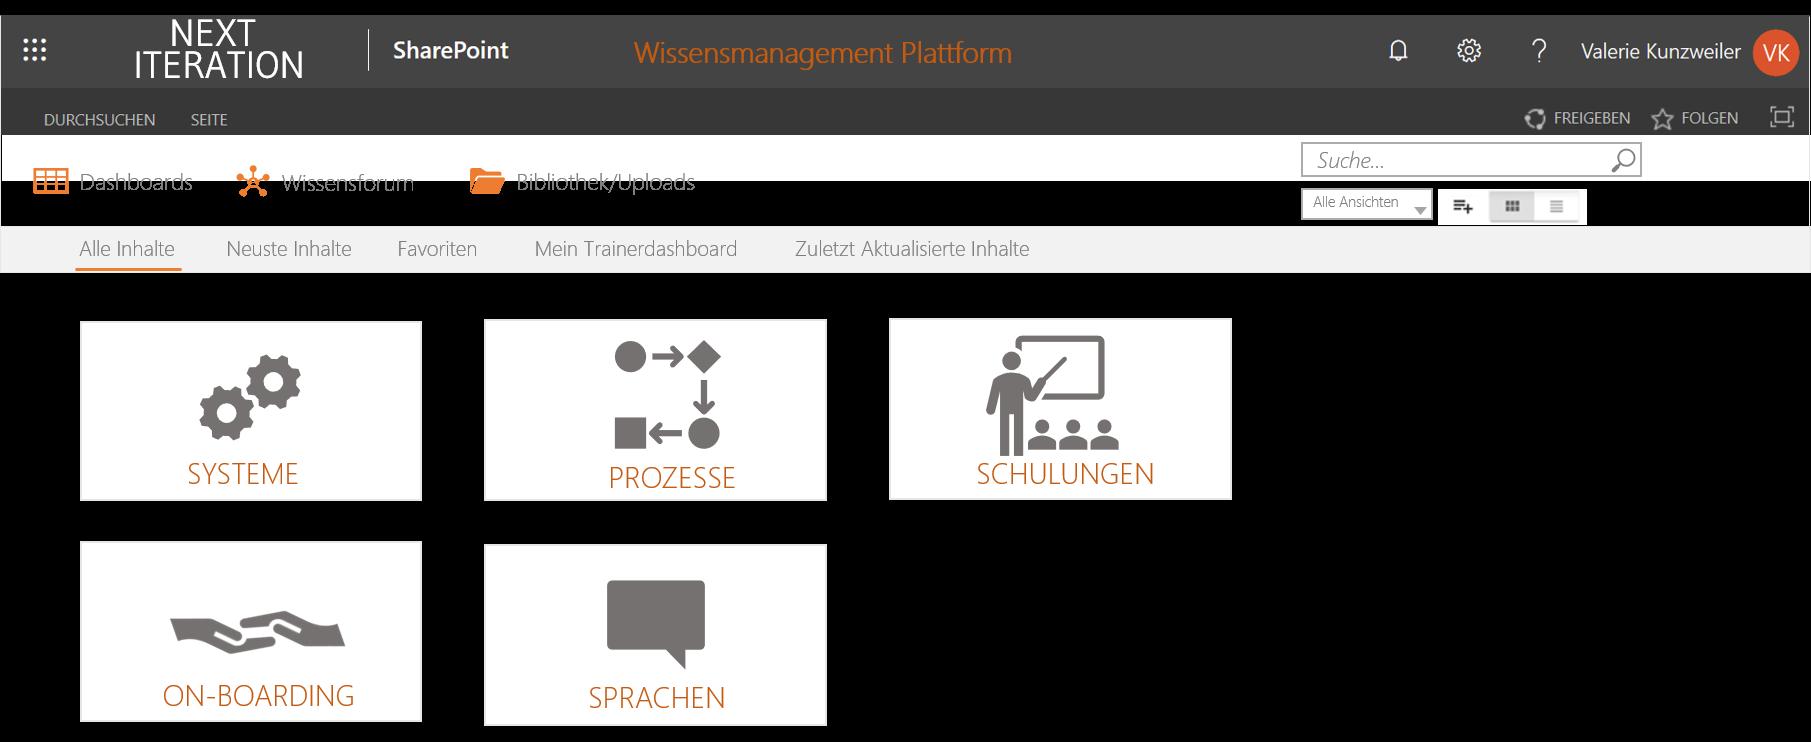 Wissensmanagement Plattform